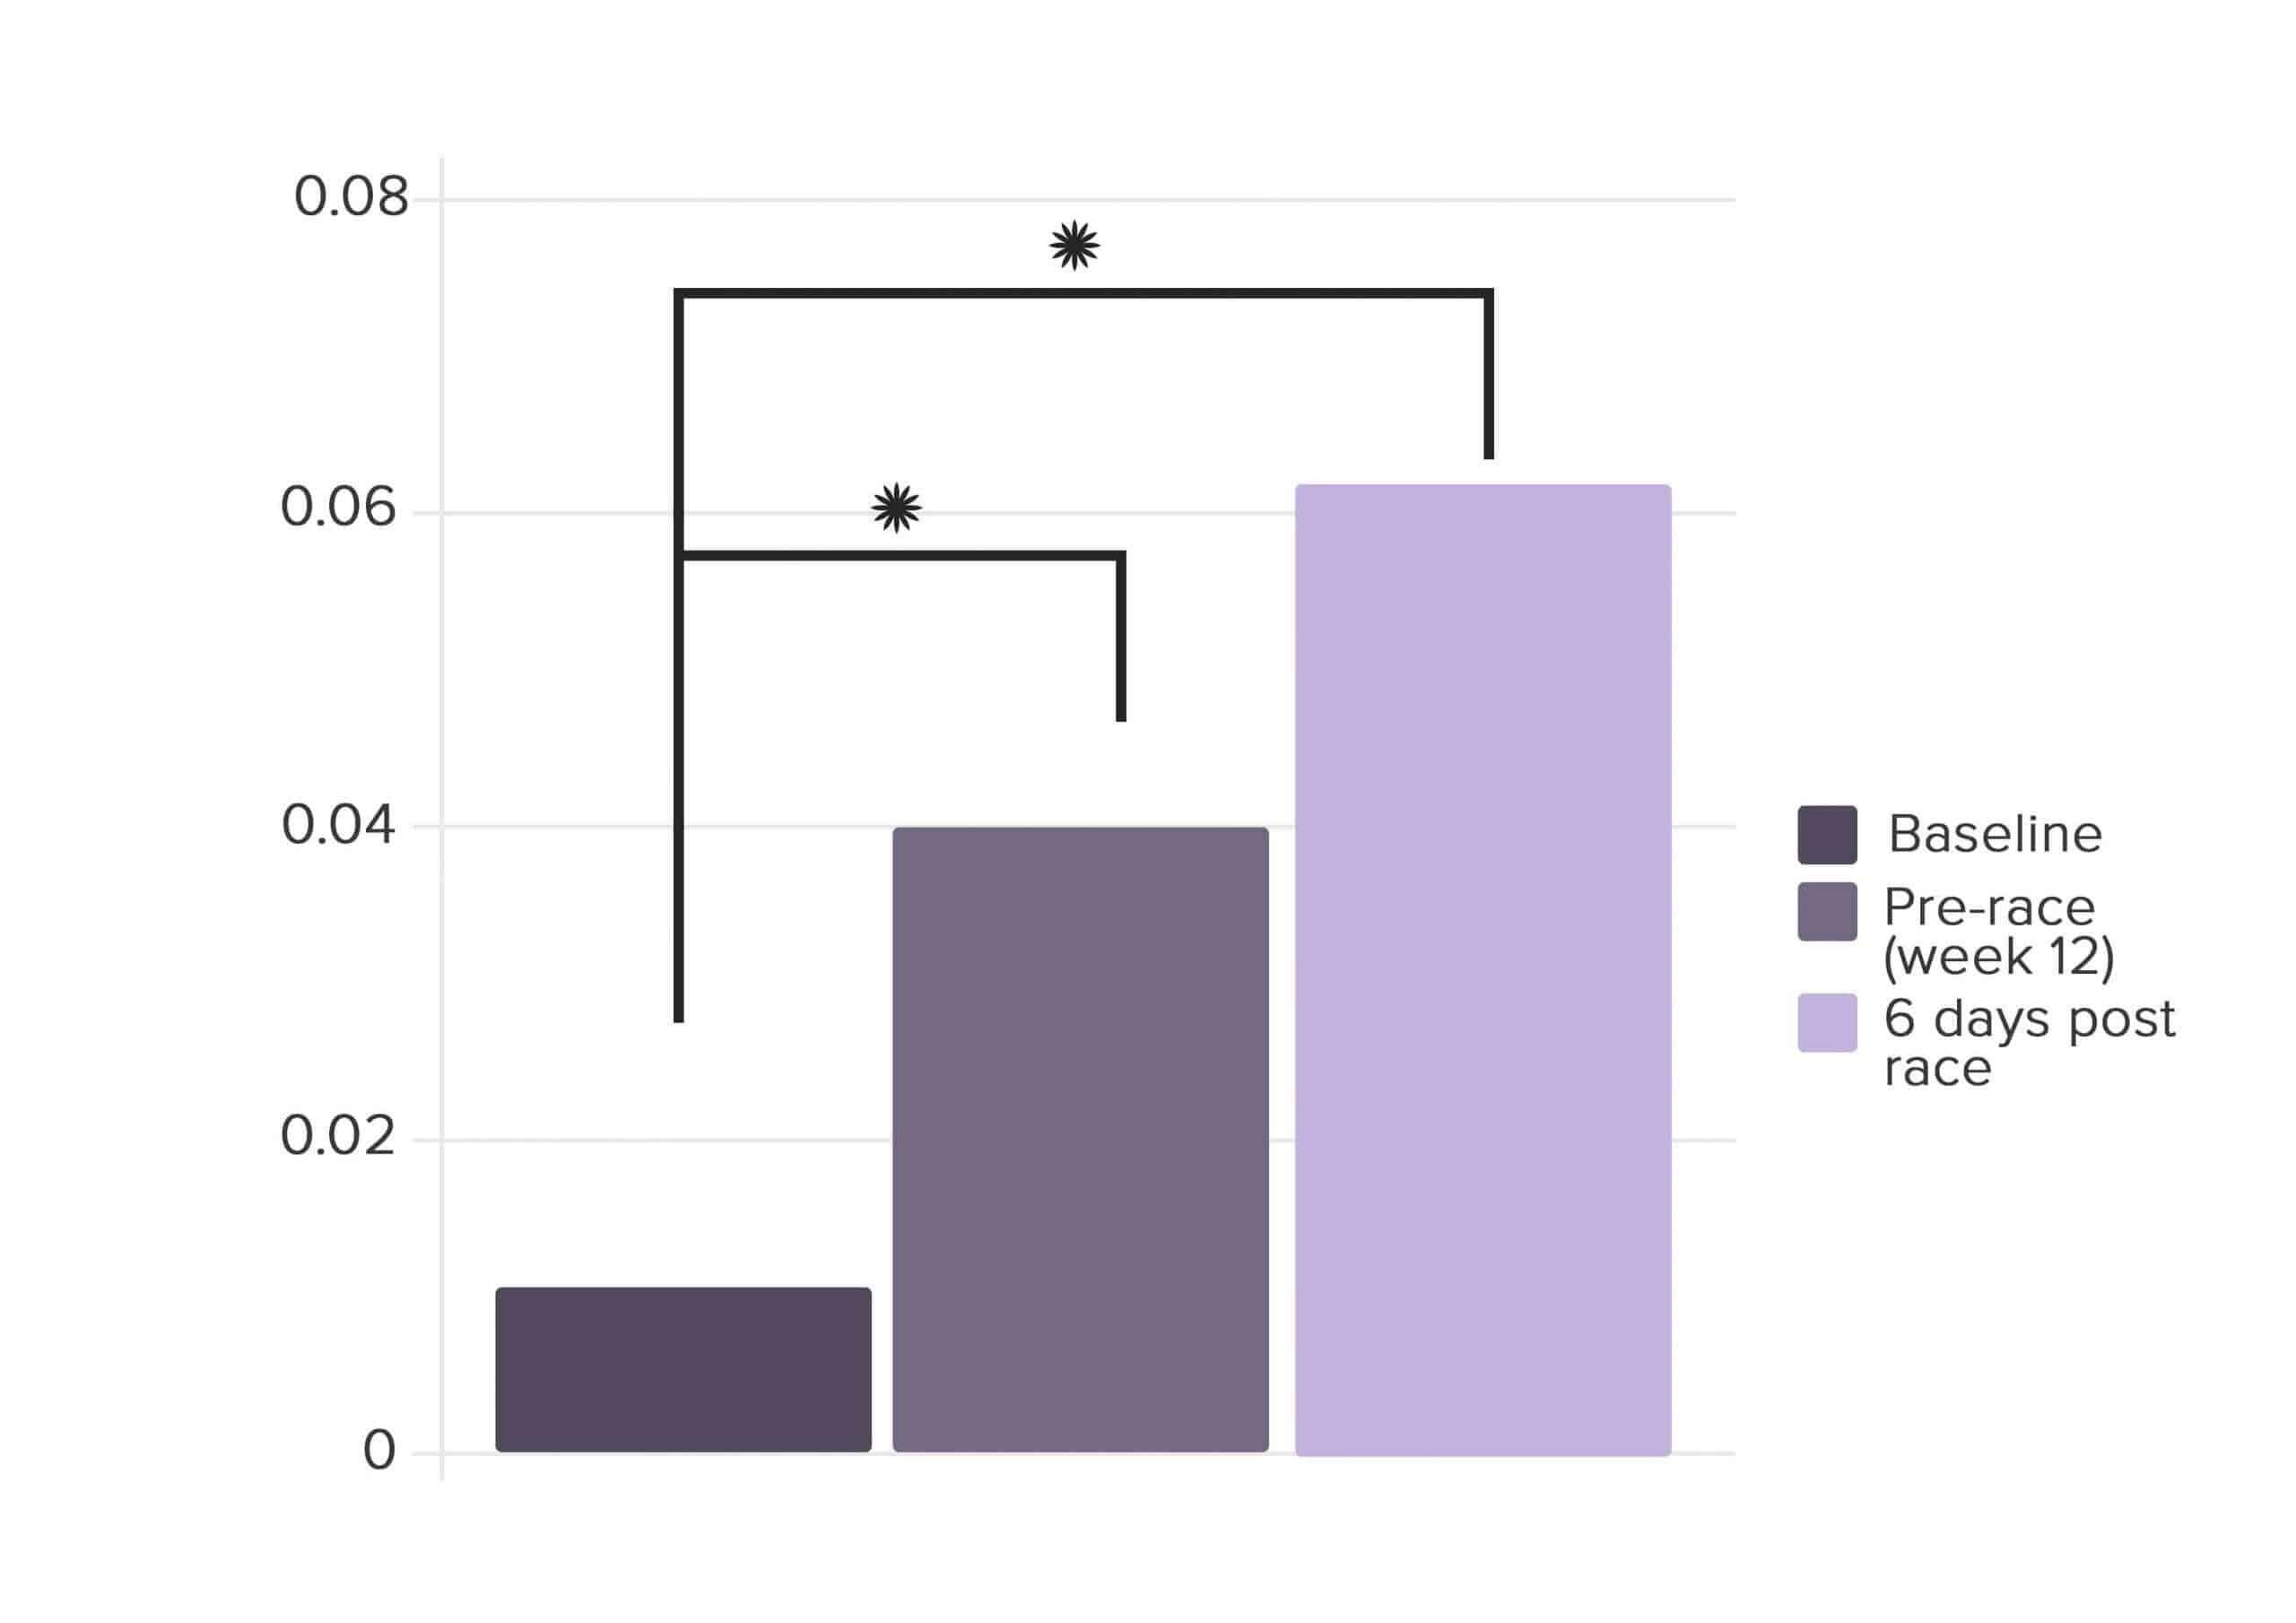 Hertfordshire Study Placebo group L:M Ratio